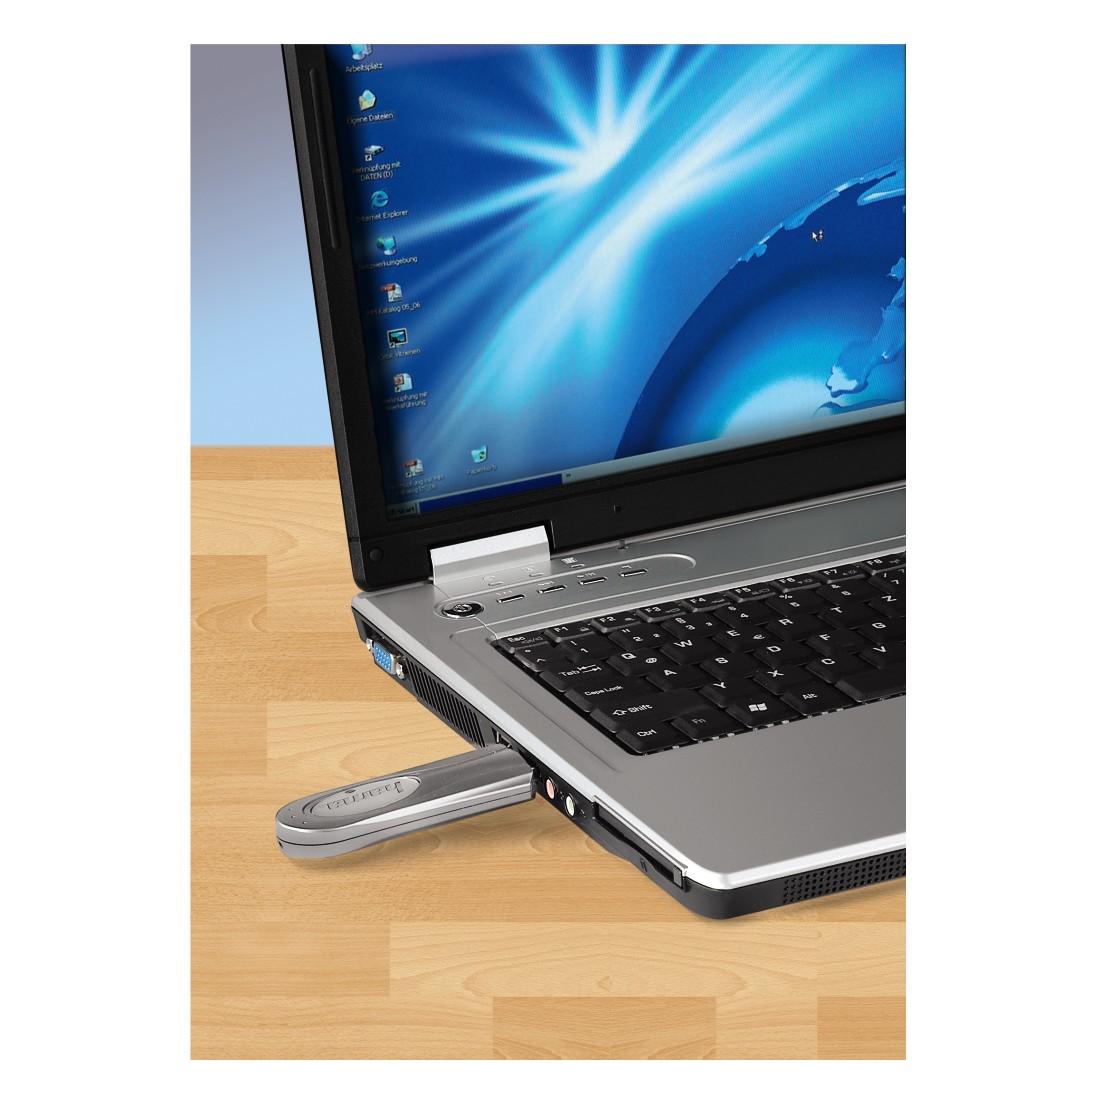 HAMA 108 Mbps WLAN USB Stick Windows 8 Driver Download